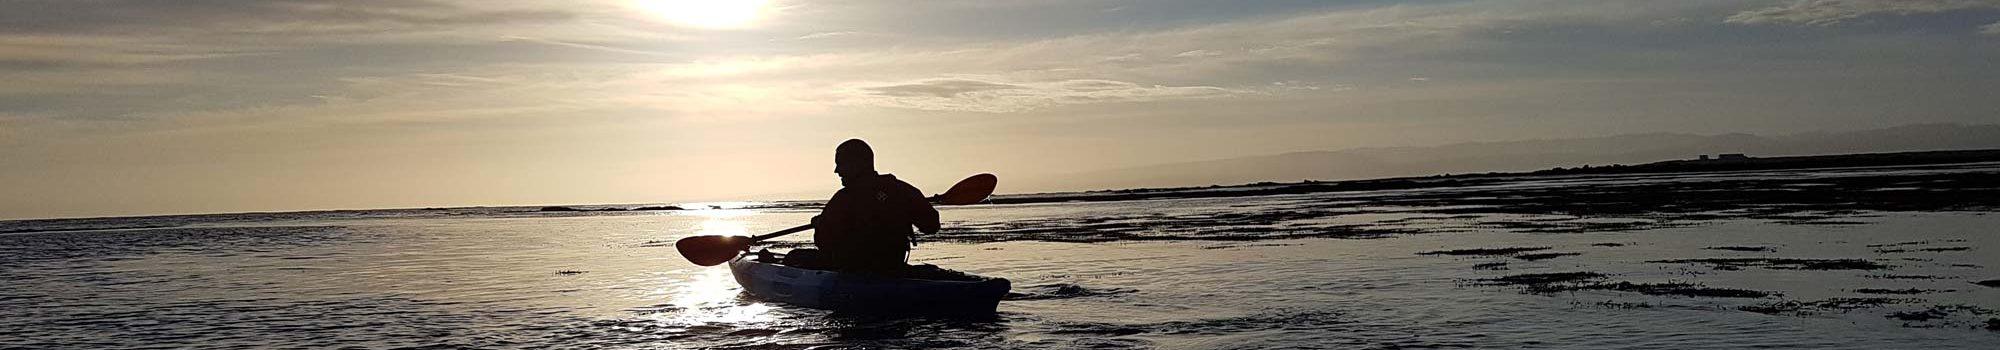 Sea Kayaking Adventure in Iceland